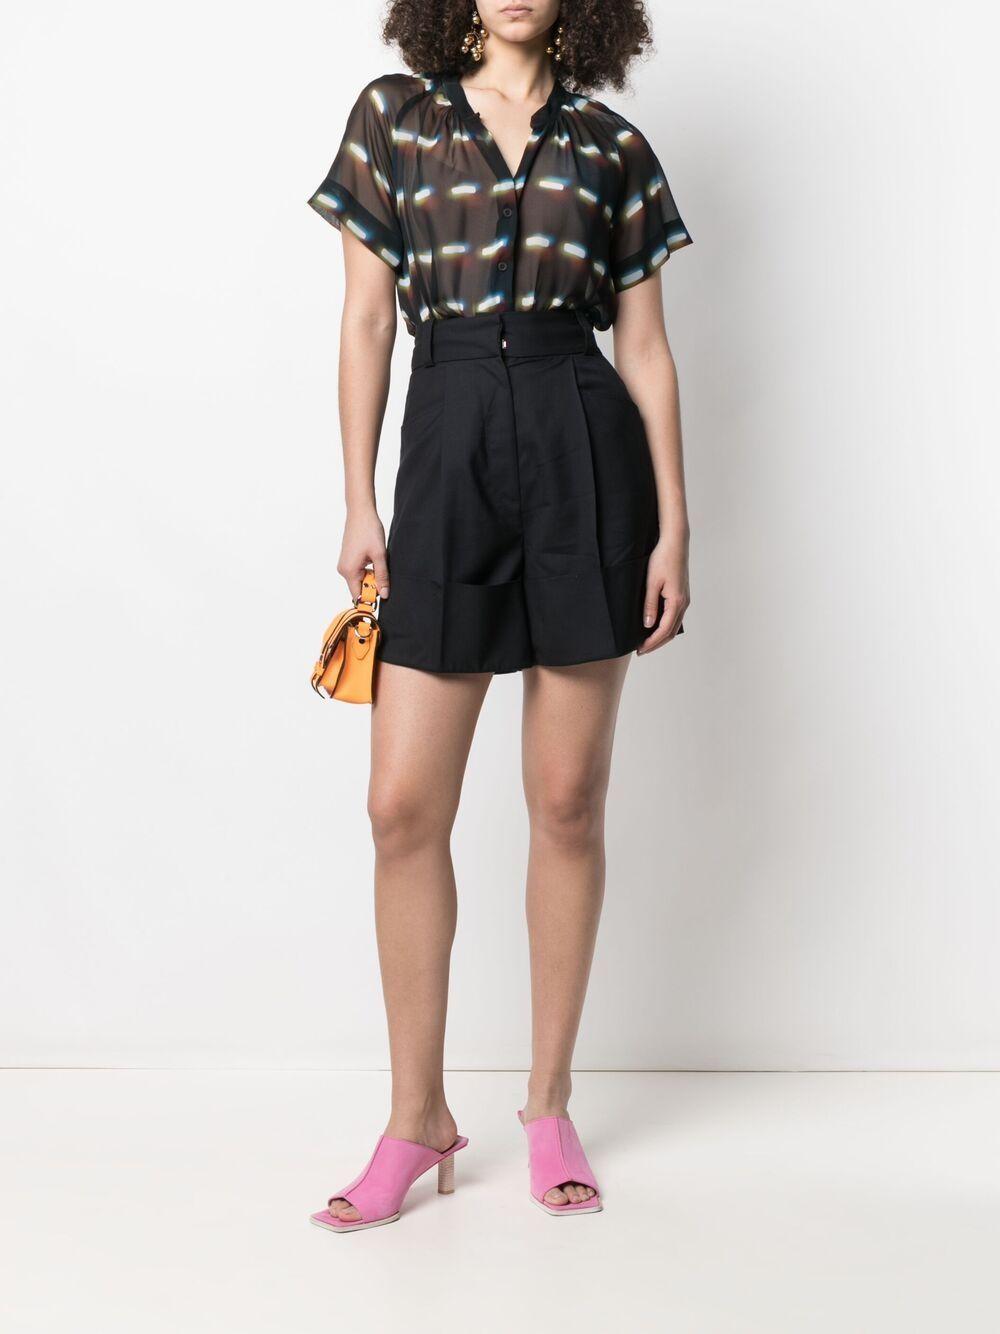 Black and blue silk abstract print blouse DRIES VAN NOTEN |  | CHEN-2088-10767900